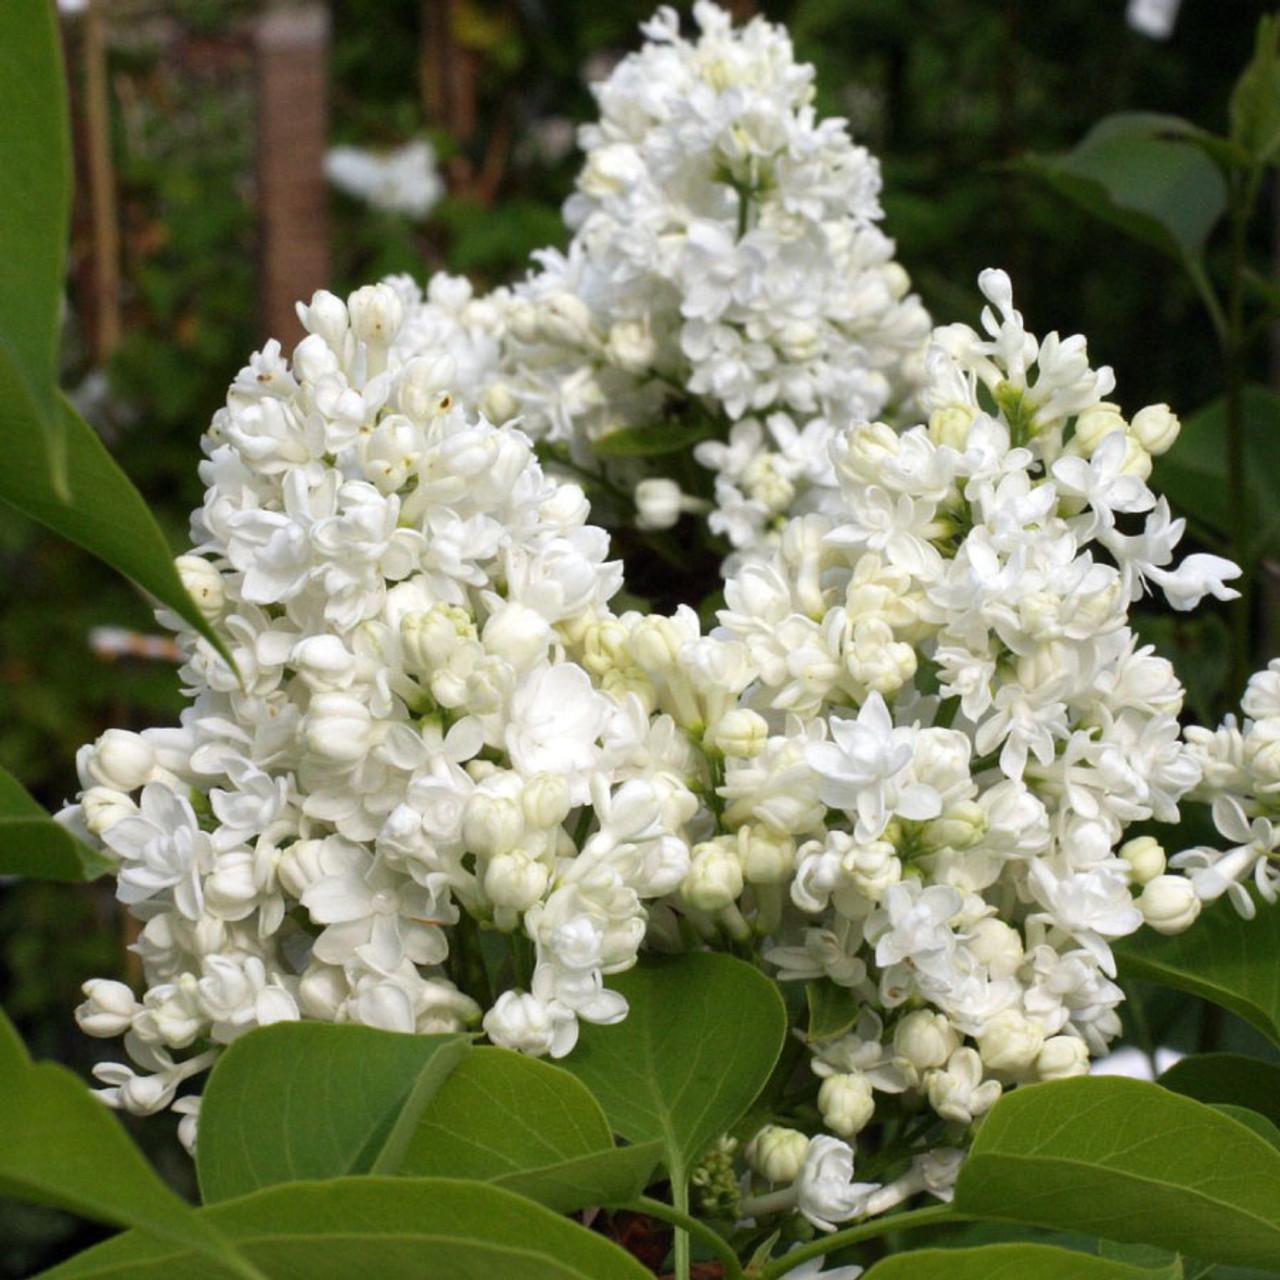 Syringa vulgaris madame lemoine mr middleton garden shop - Syringa vulgaris ...